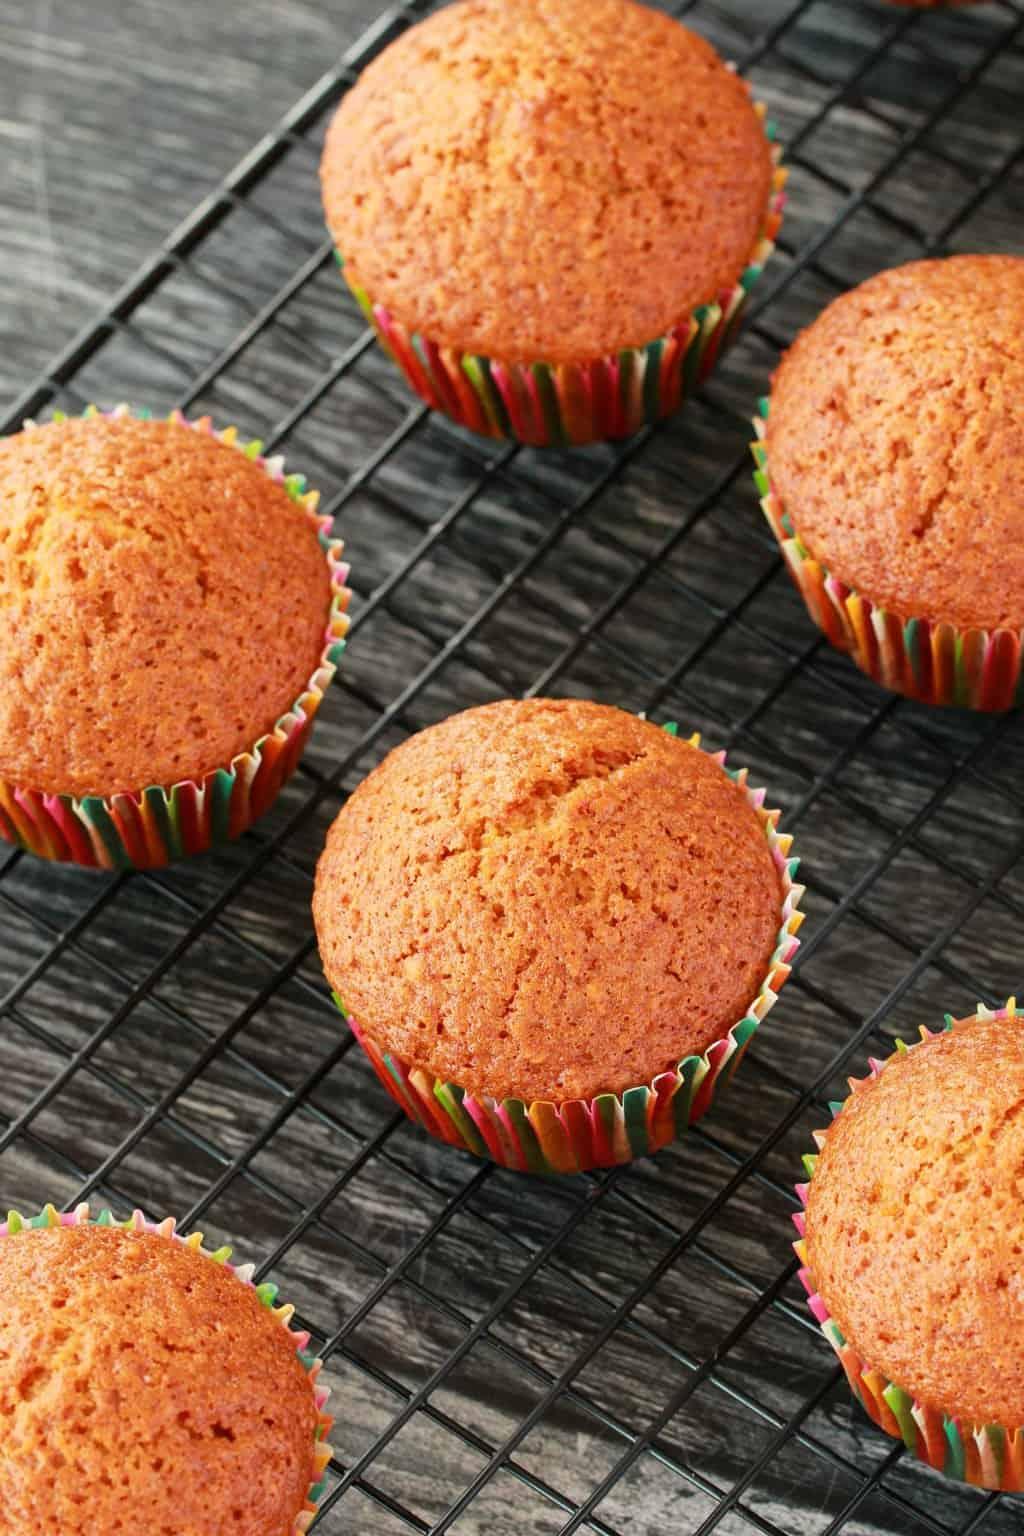 Making Vegan Peppermint Cupcakes #vegan #lovingitvegan #cupcakes #dairyfree #dessert